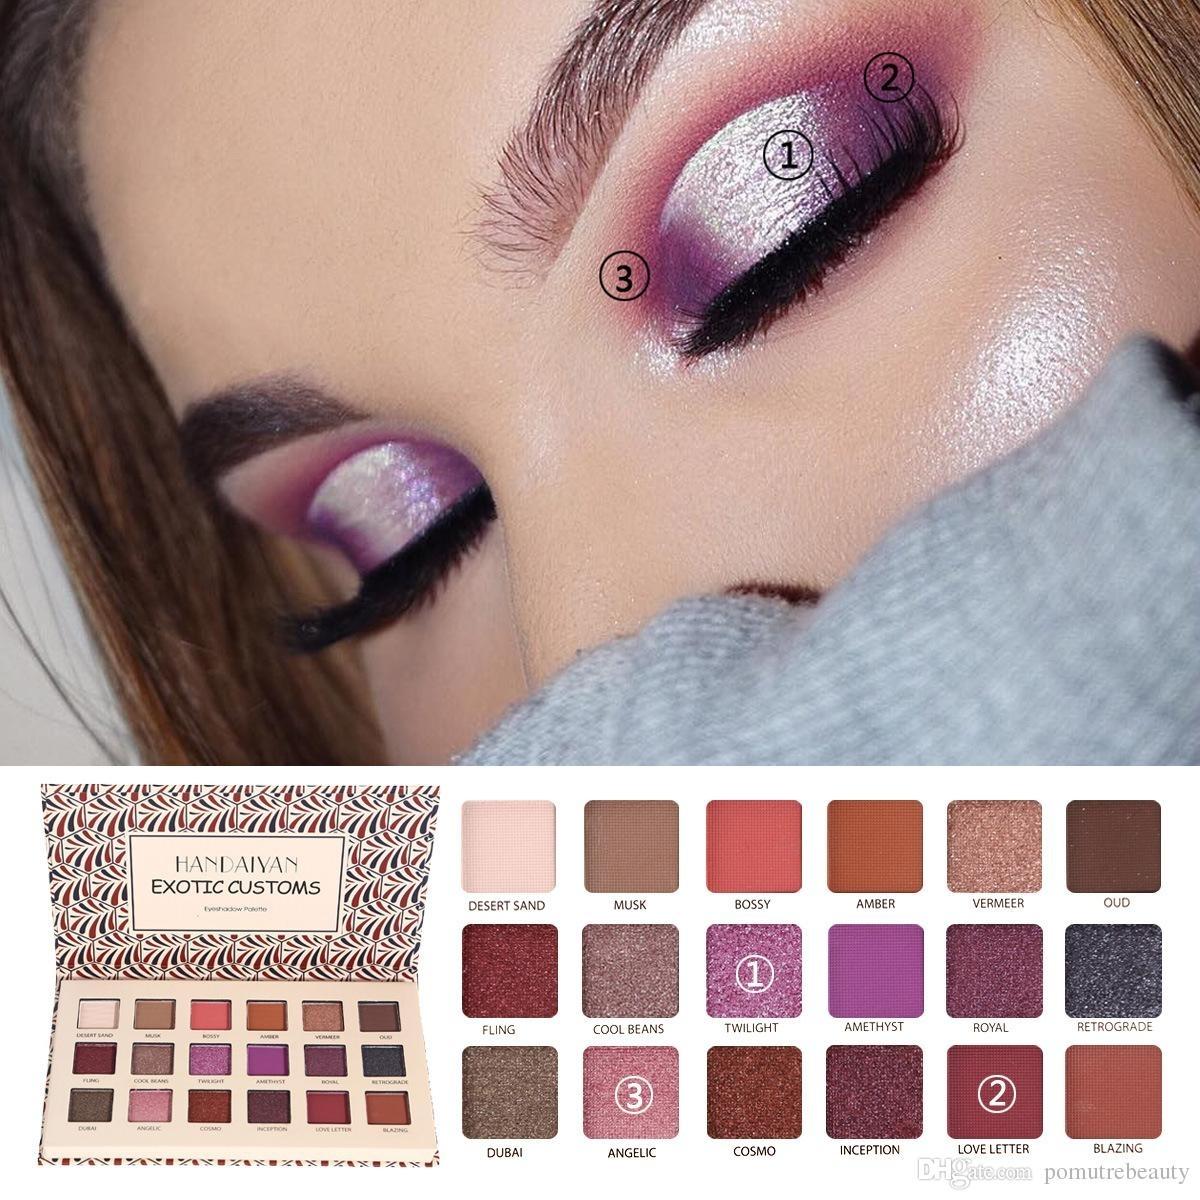 Makeup Eyeshadow Palette 2018 Matte High Pigment Eyeshadow Palette with Makeup Palettes For Green Eyes